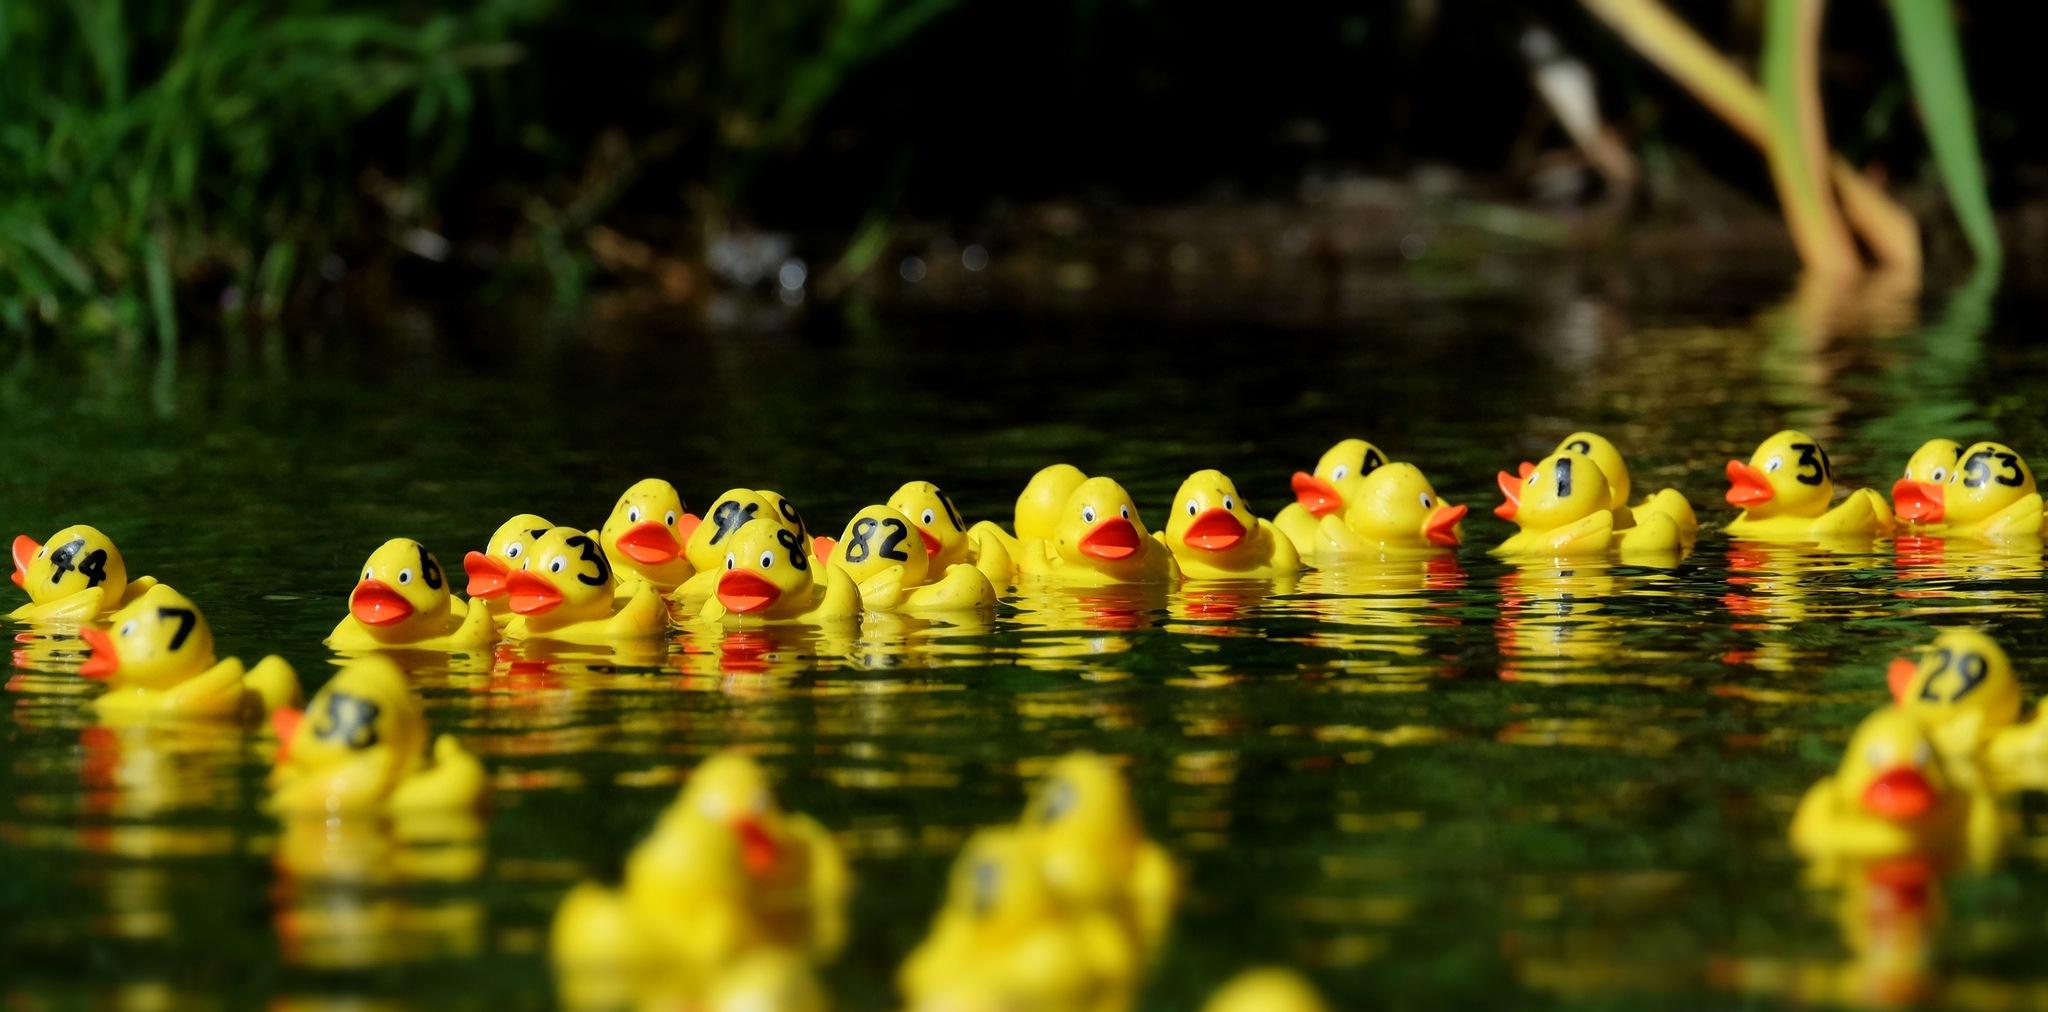 Braunton Duck Race by John191cr